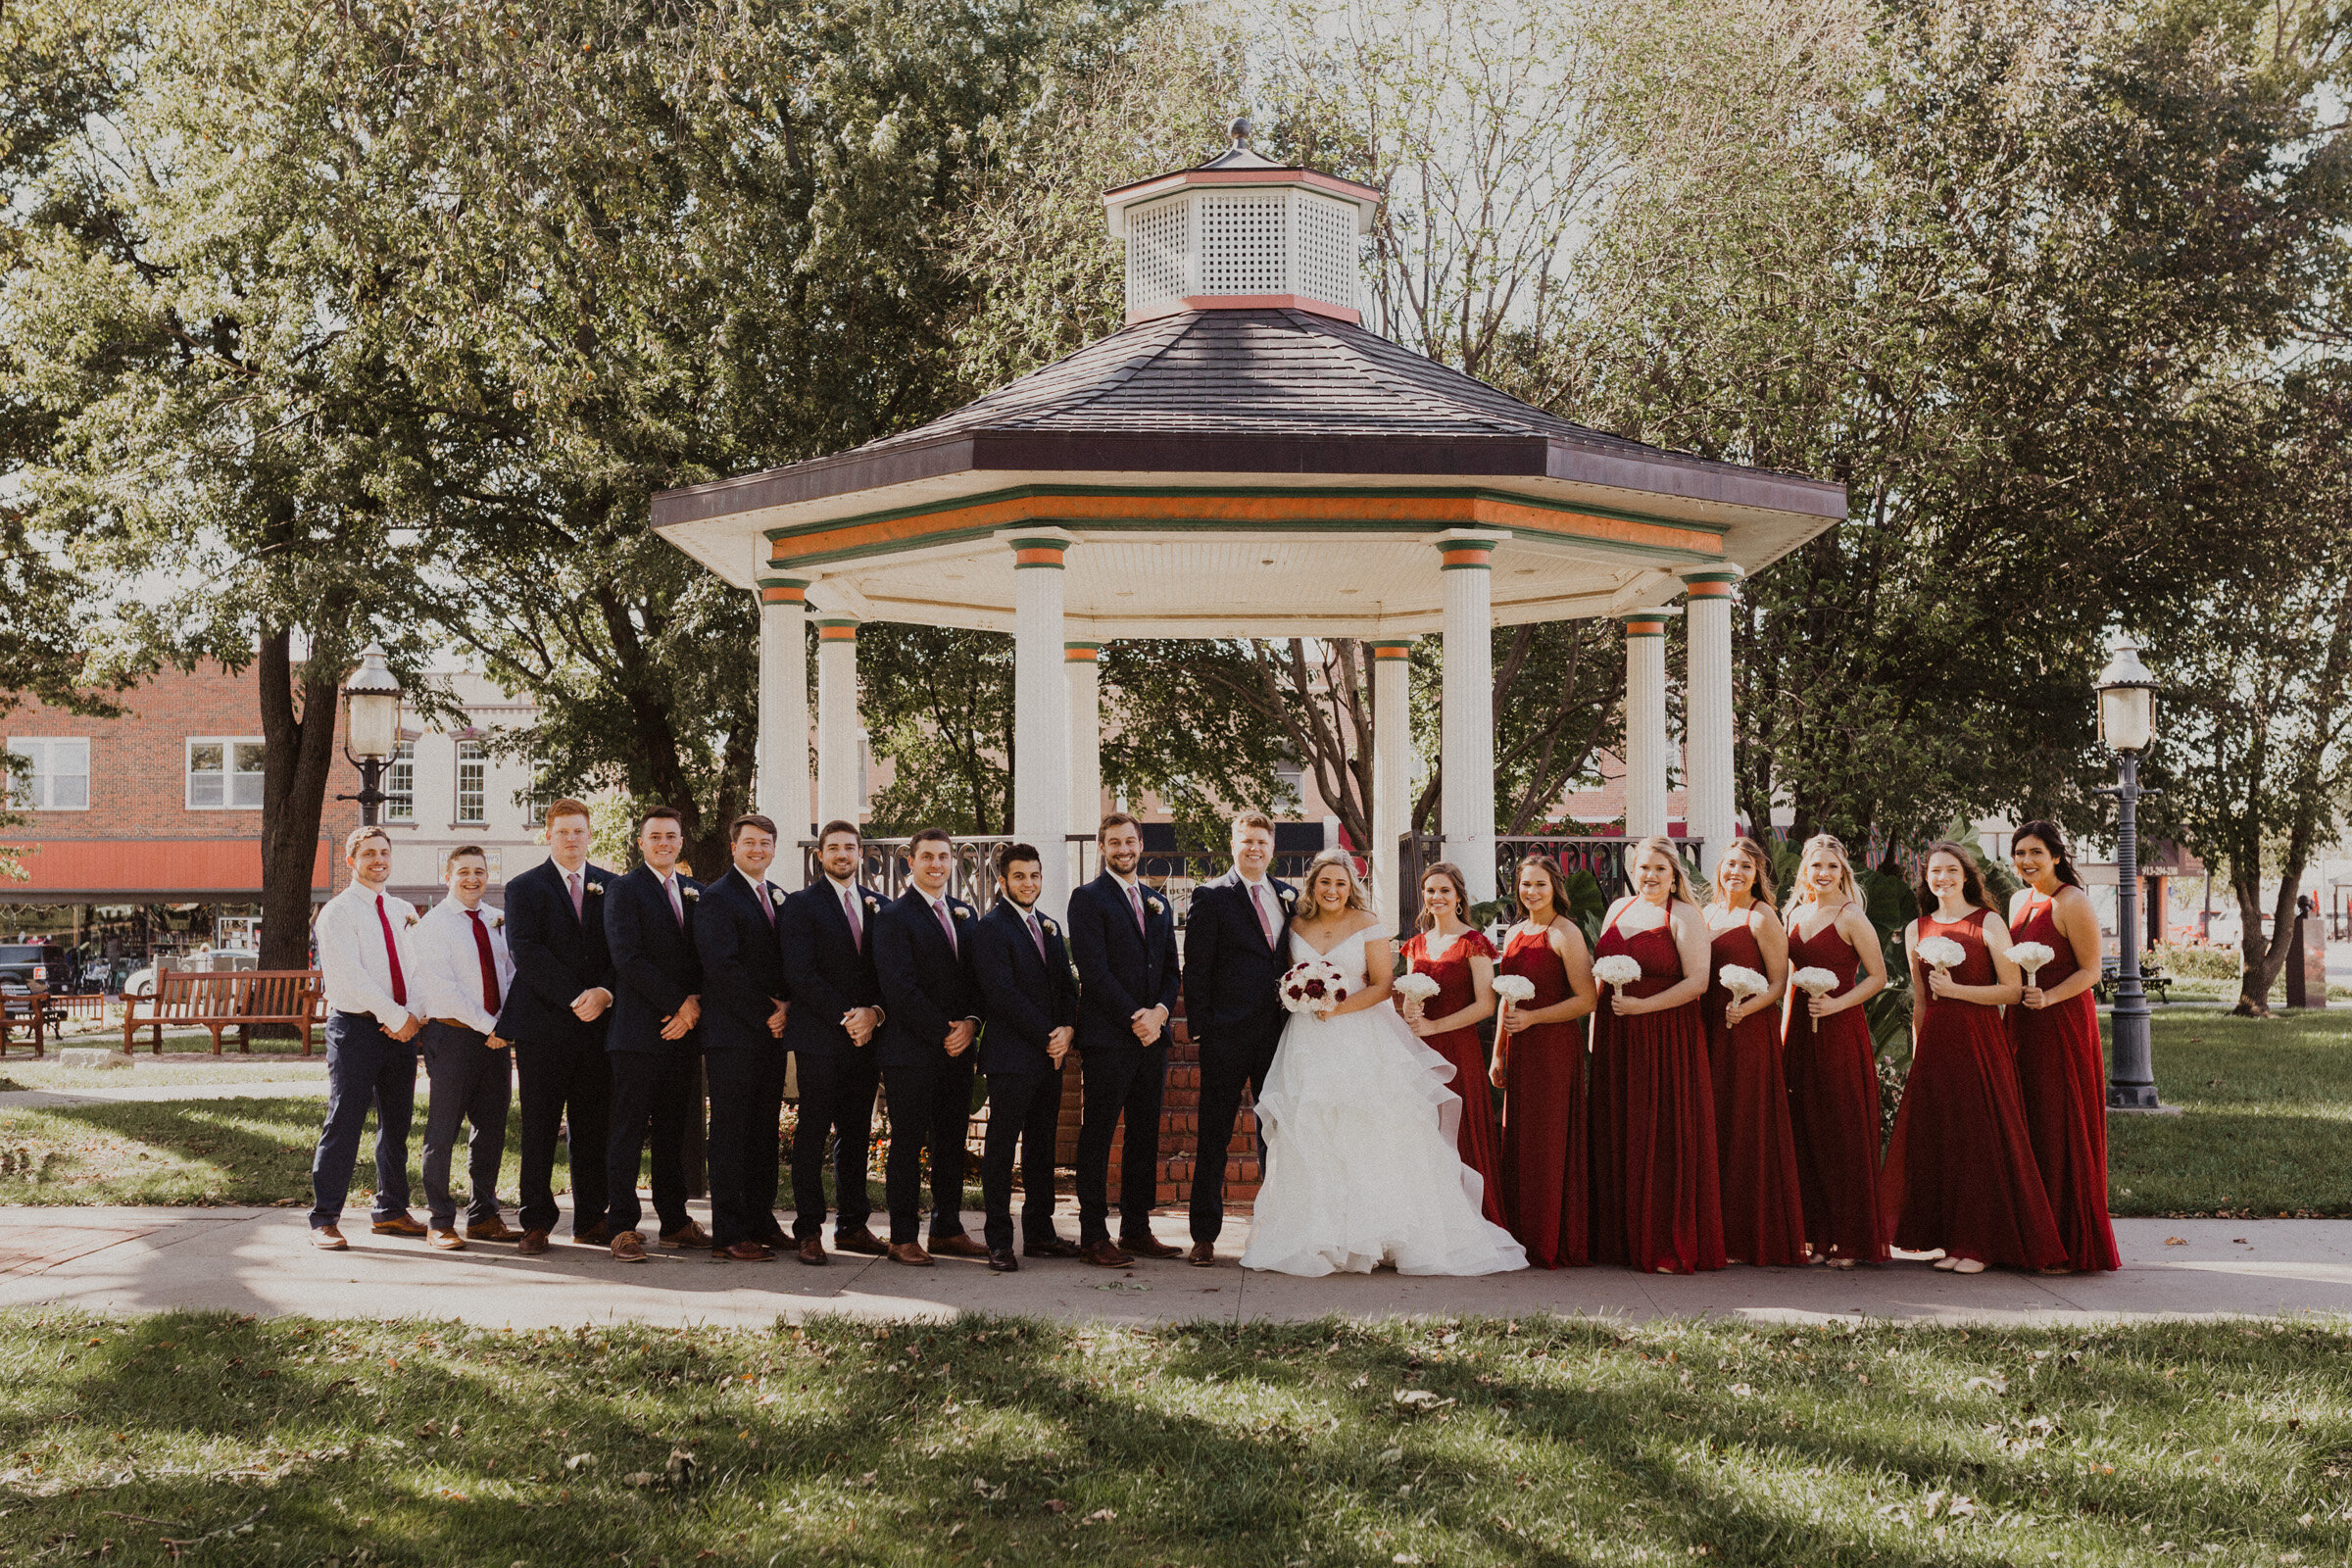 alyssa barletter photography town square paola wedding-11.jpg